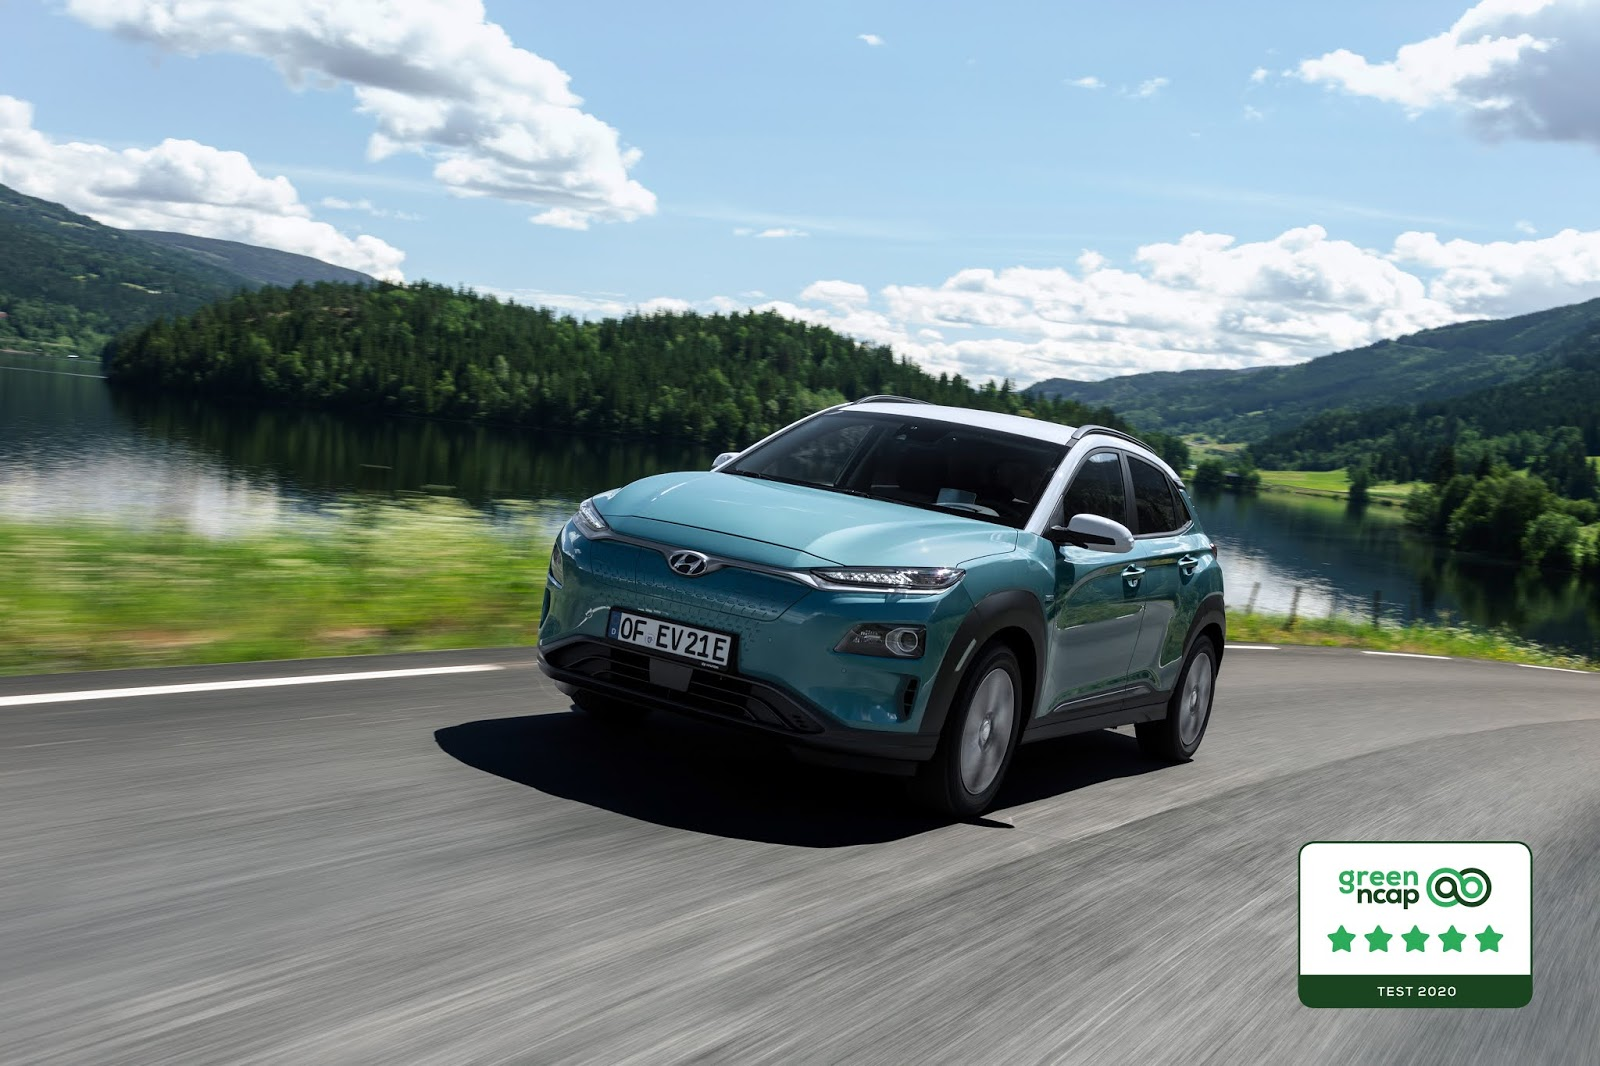 hyundai kona electric green ncap KΟΝΑ Electric : Ηλεκτροκίνηση χωρίς συμβιβασμούς για 10+1 λόγους! Electric cars, electric vehicles, EV, Hyundai, Hyundai Kona, KONA Electric, ειδήσεις, ηλεκτρικά, ηλεκτροκινηση